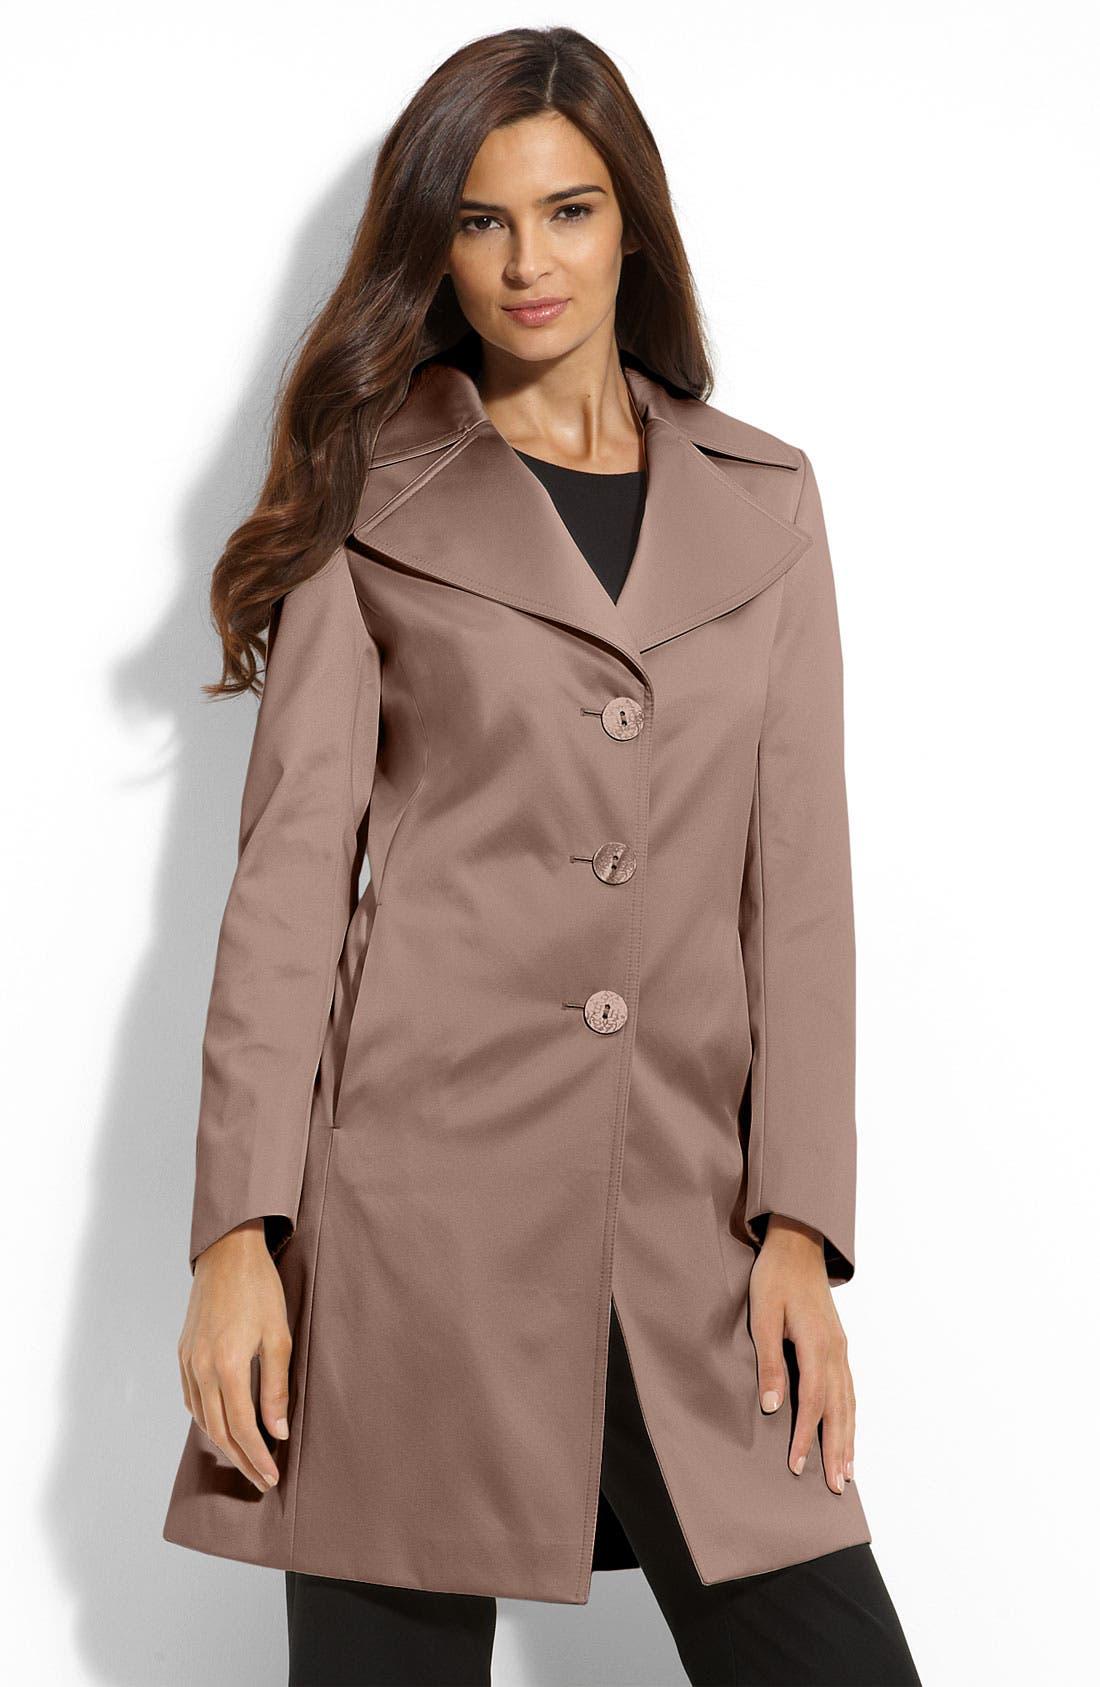 'Lola' Notched Collar Walking Coat,                         Main,                         color, Vintage Rose